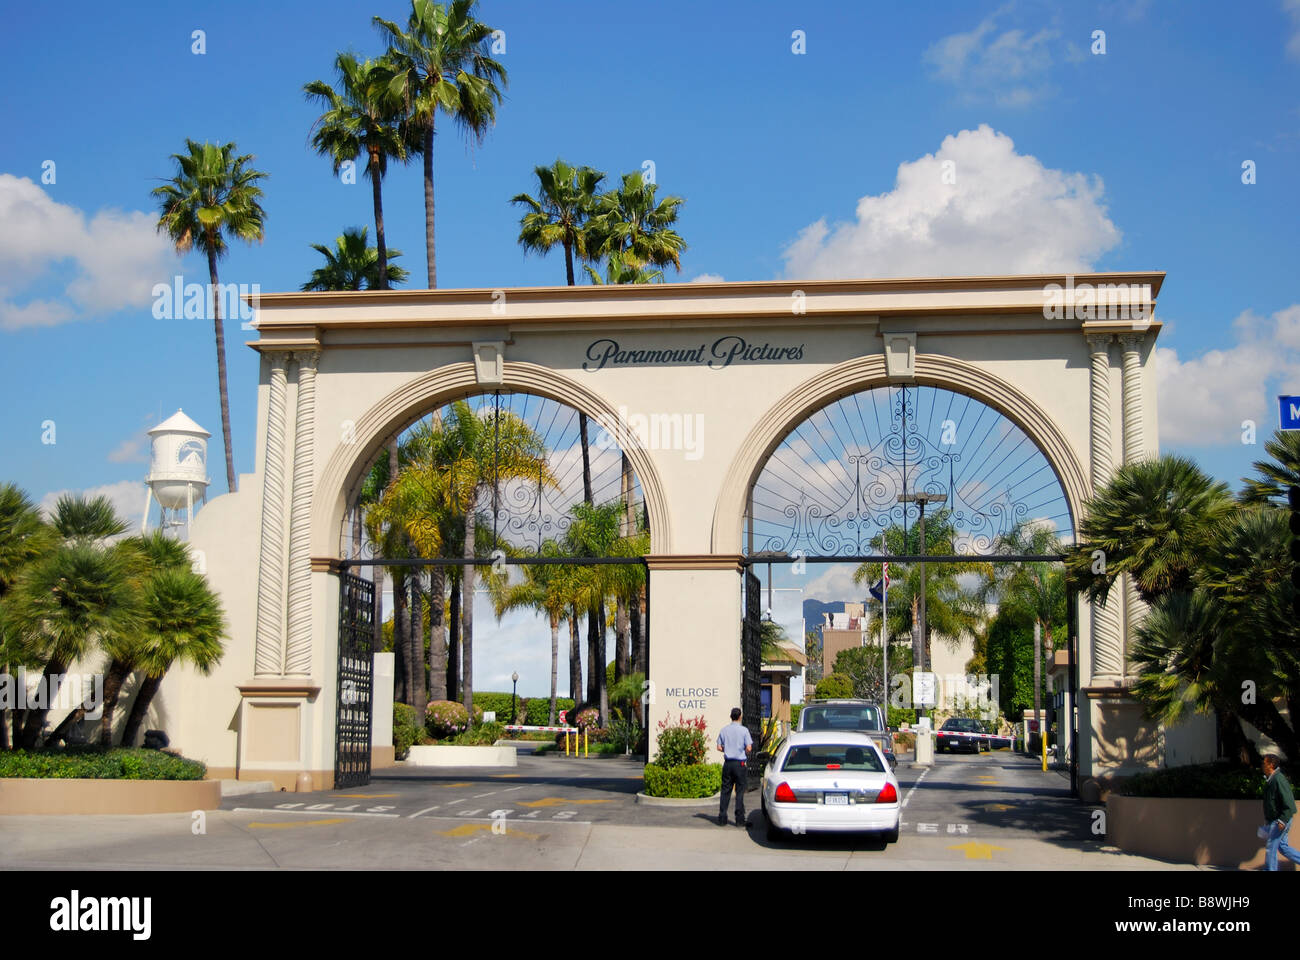 Entrada para a Paramount Studios, Melrose Avenue, Hollywood, Los Angeles, Califórnia, Estados Unidos da América Foto de Stock